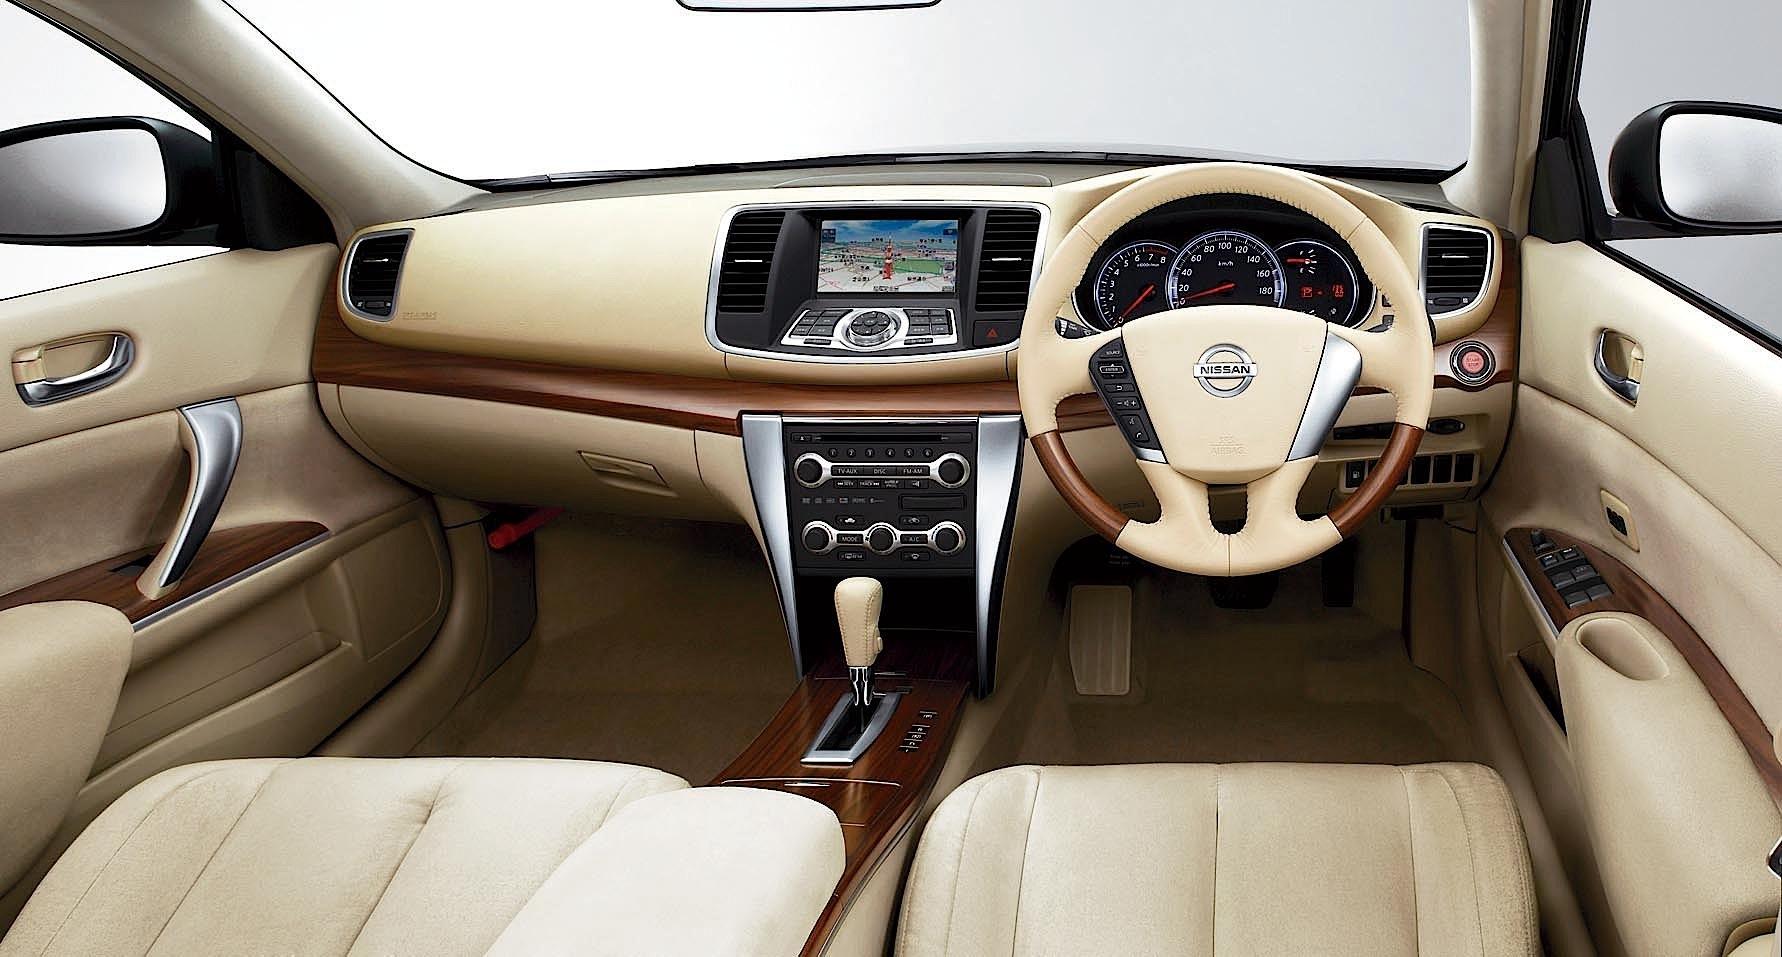 Nissan Teana II Restyling 2011 - 2014 Sedan #7